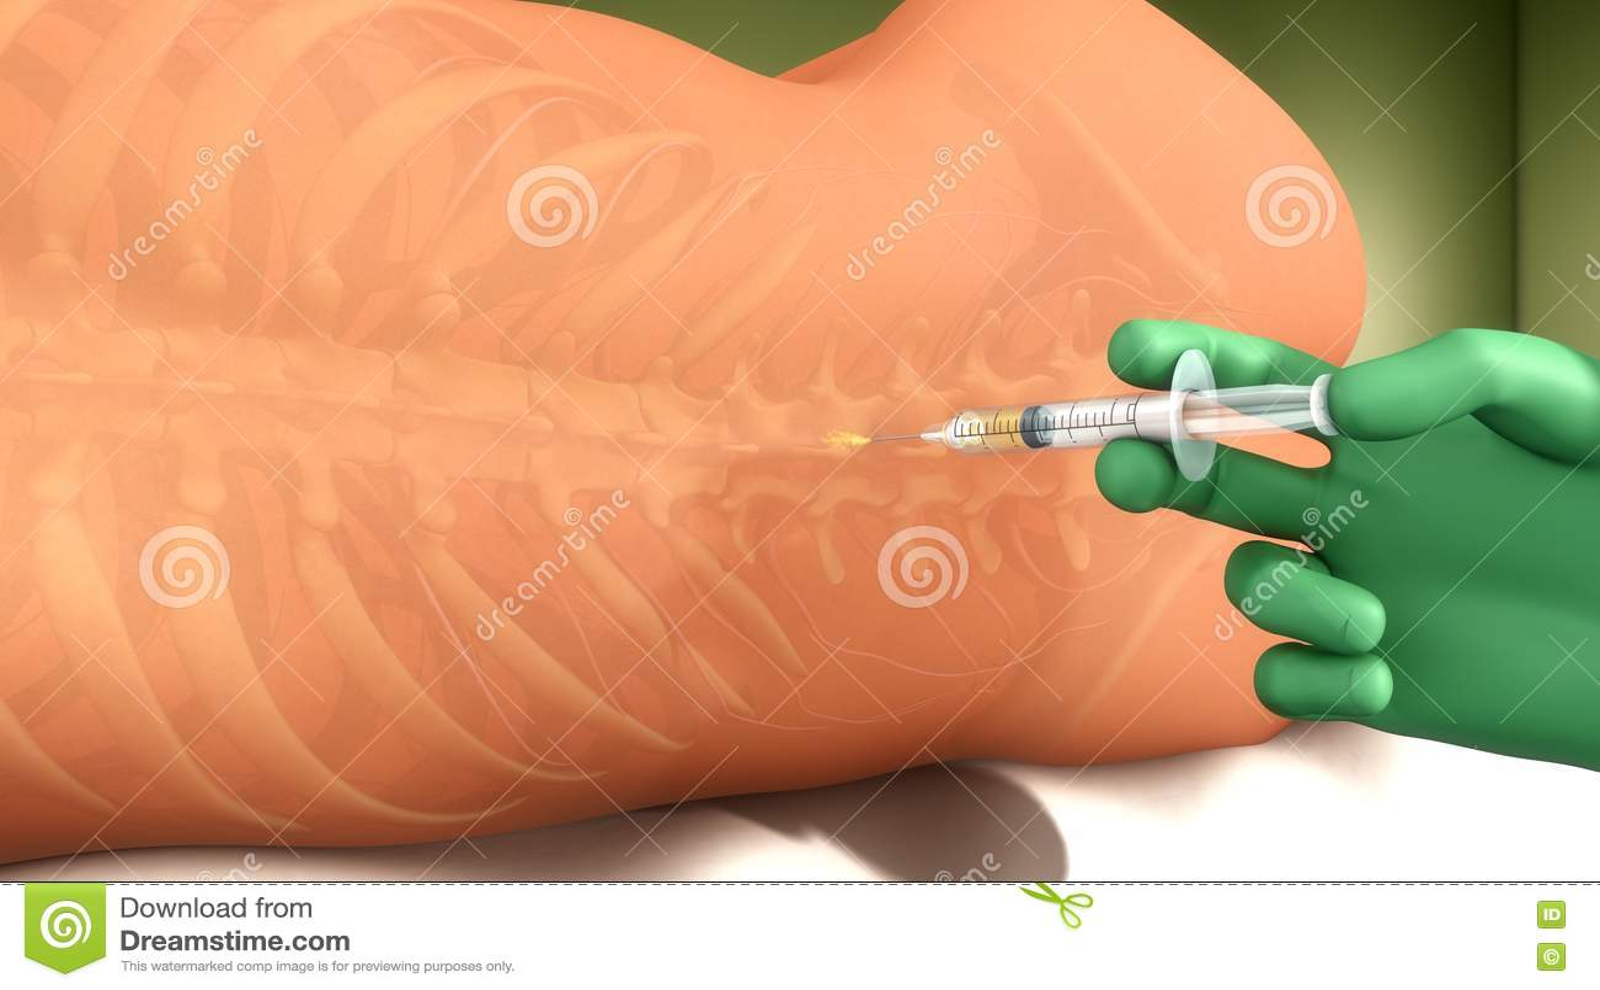 Anestesia espinal stock de ilustración. Ilustración de bebé - 73449798